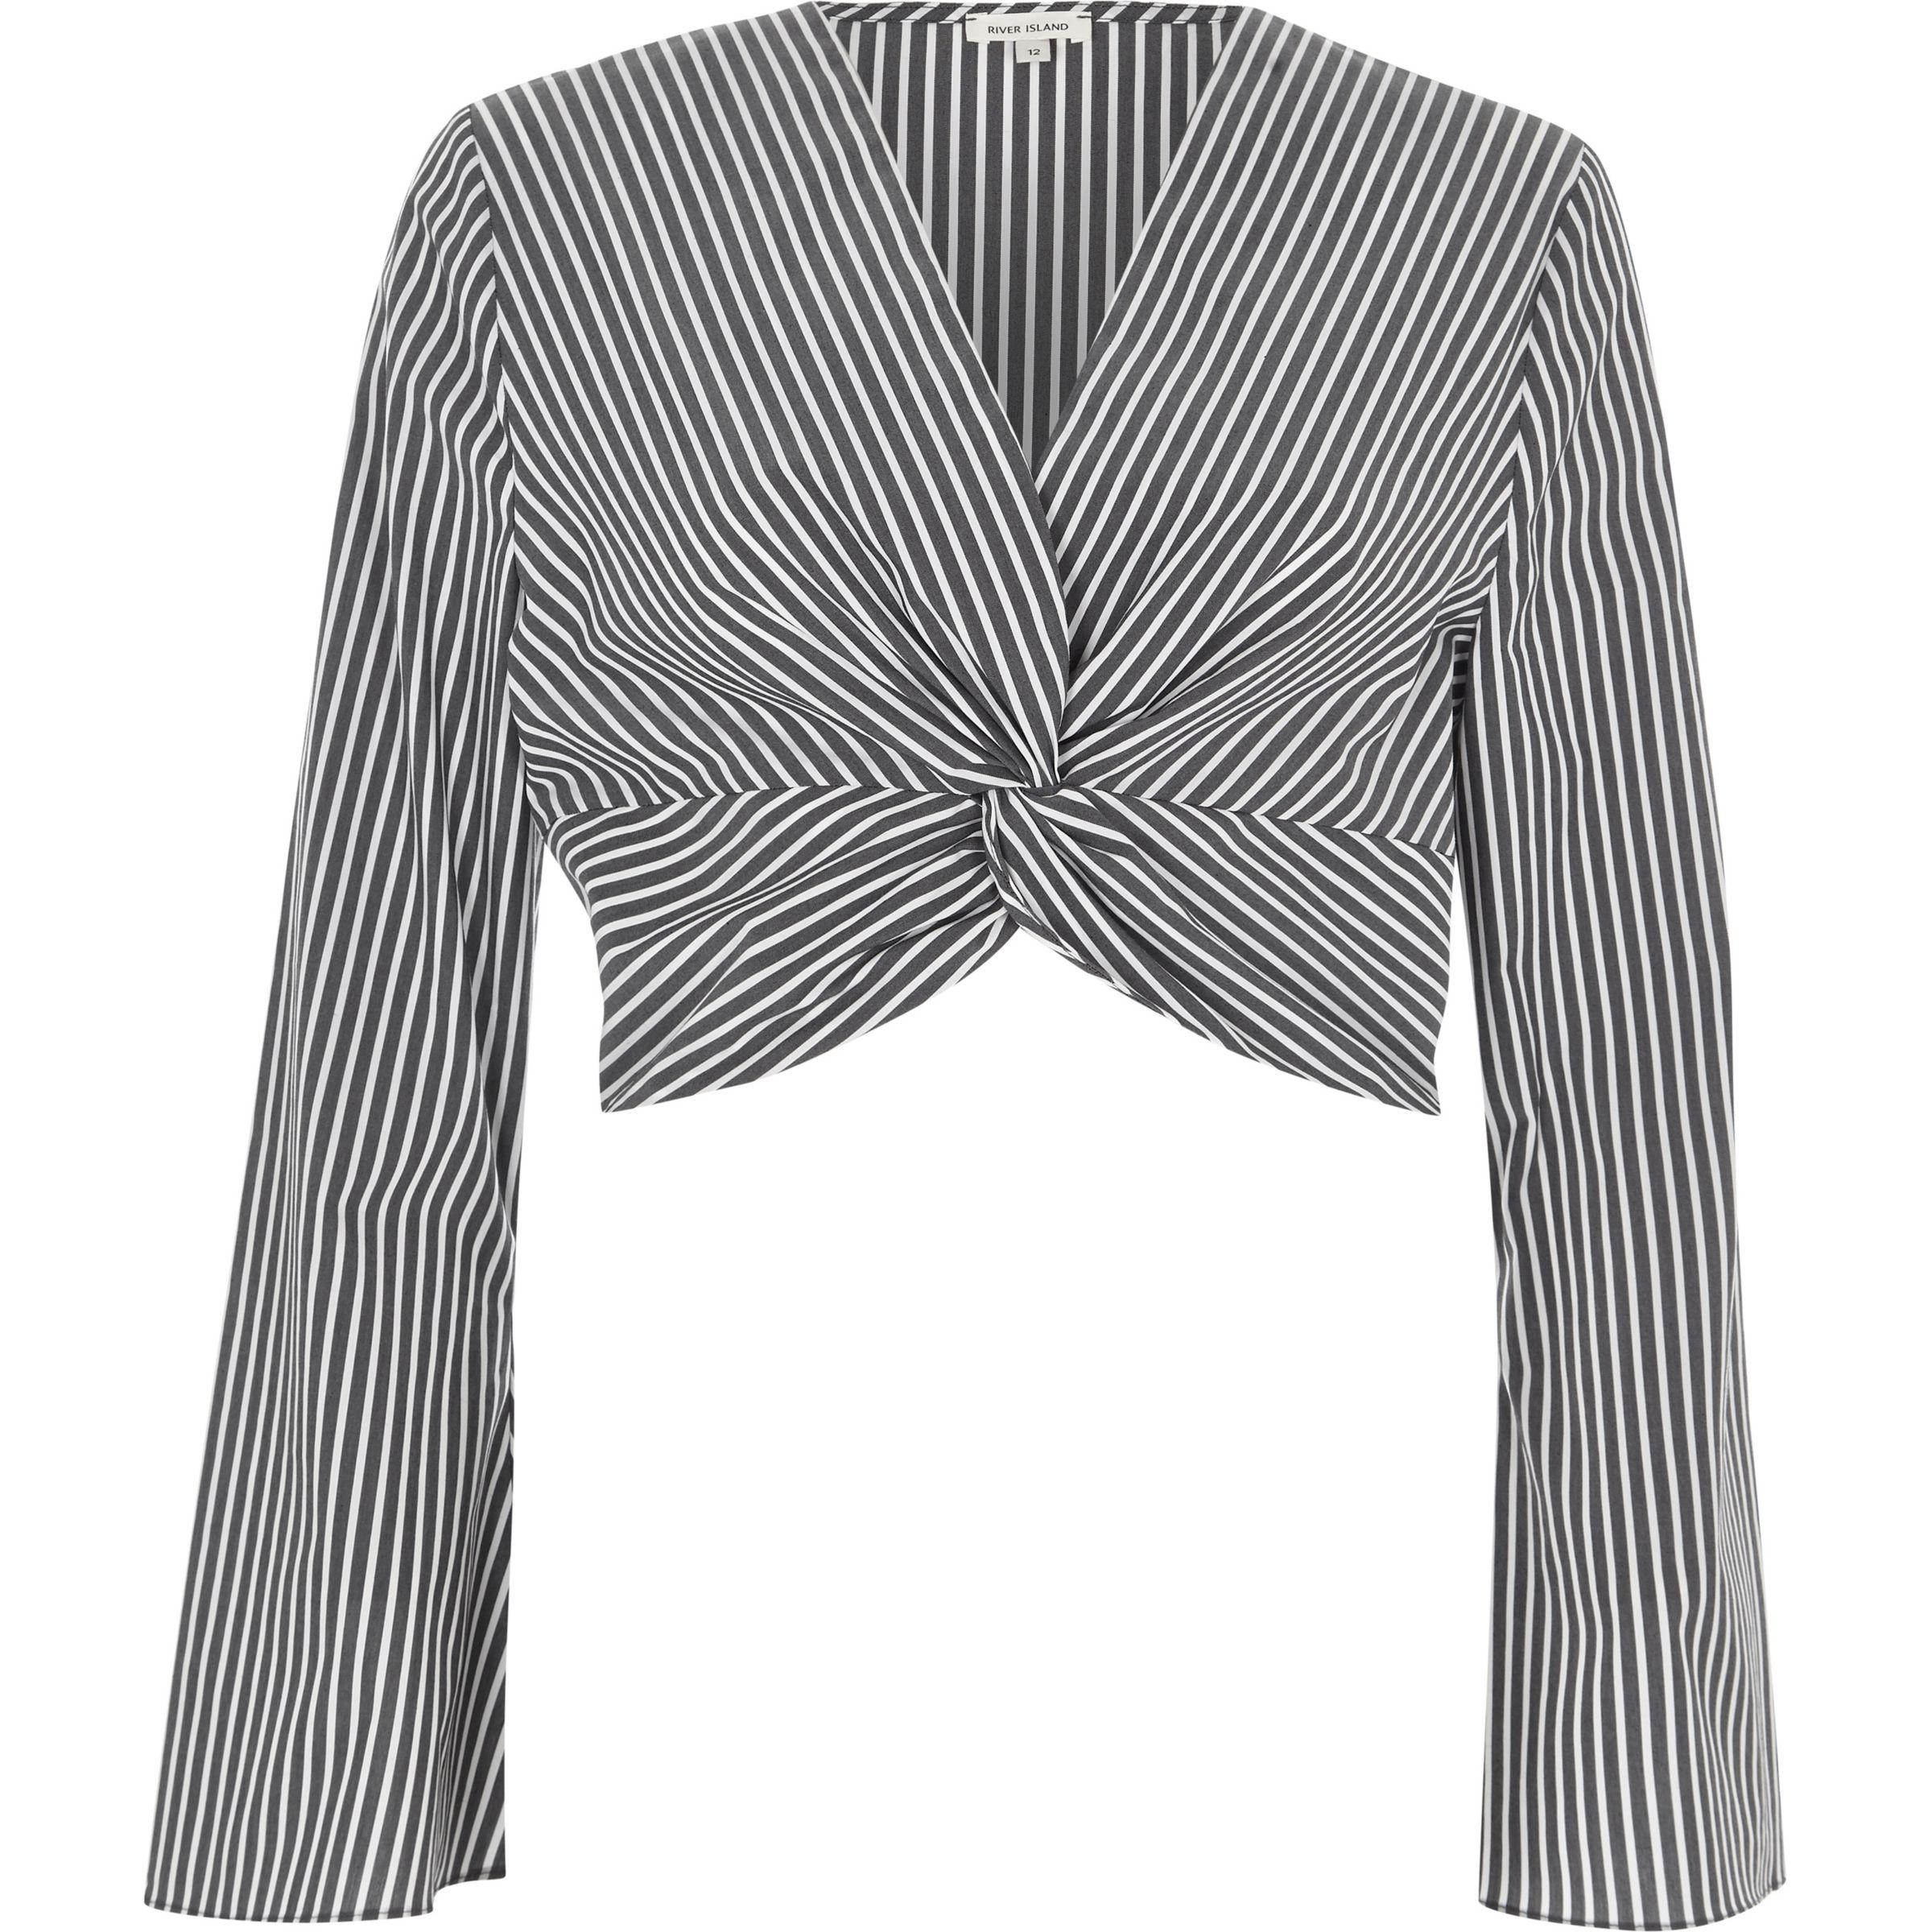 0d0a3c242e26 Lyst - River Island Black Stripe Print Knot Long Sleeve Crop Top in ...